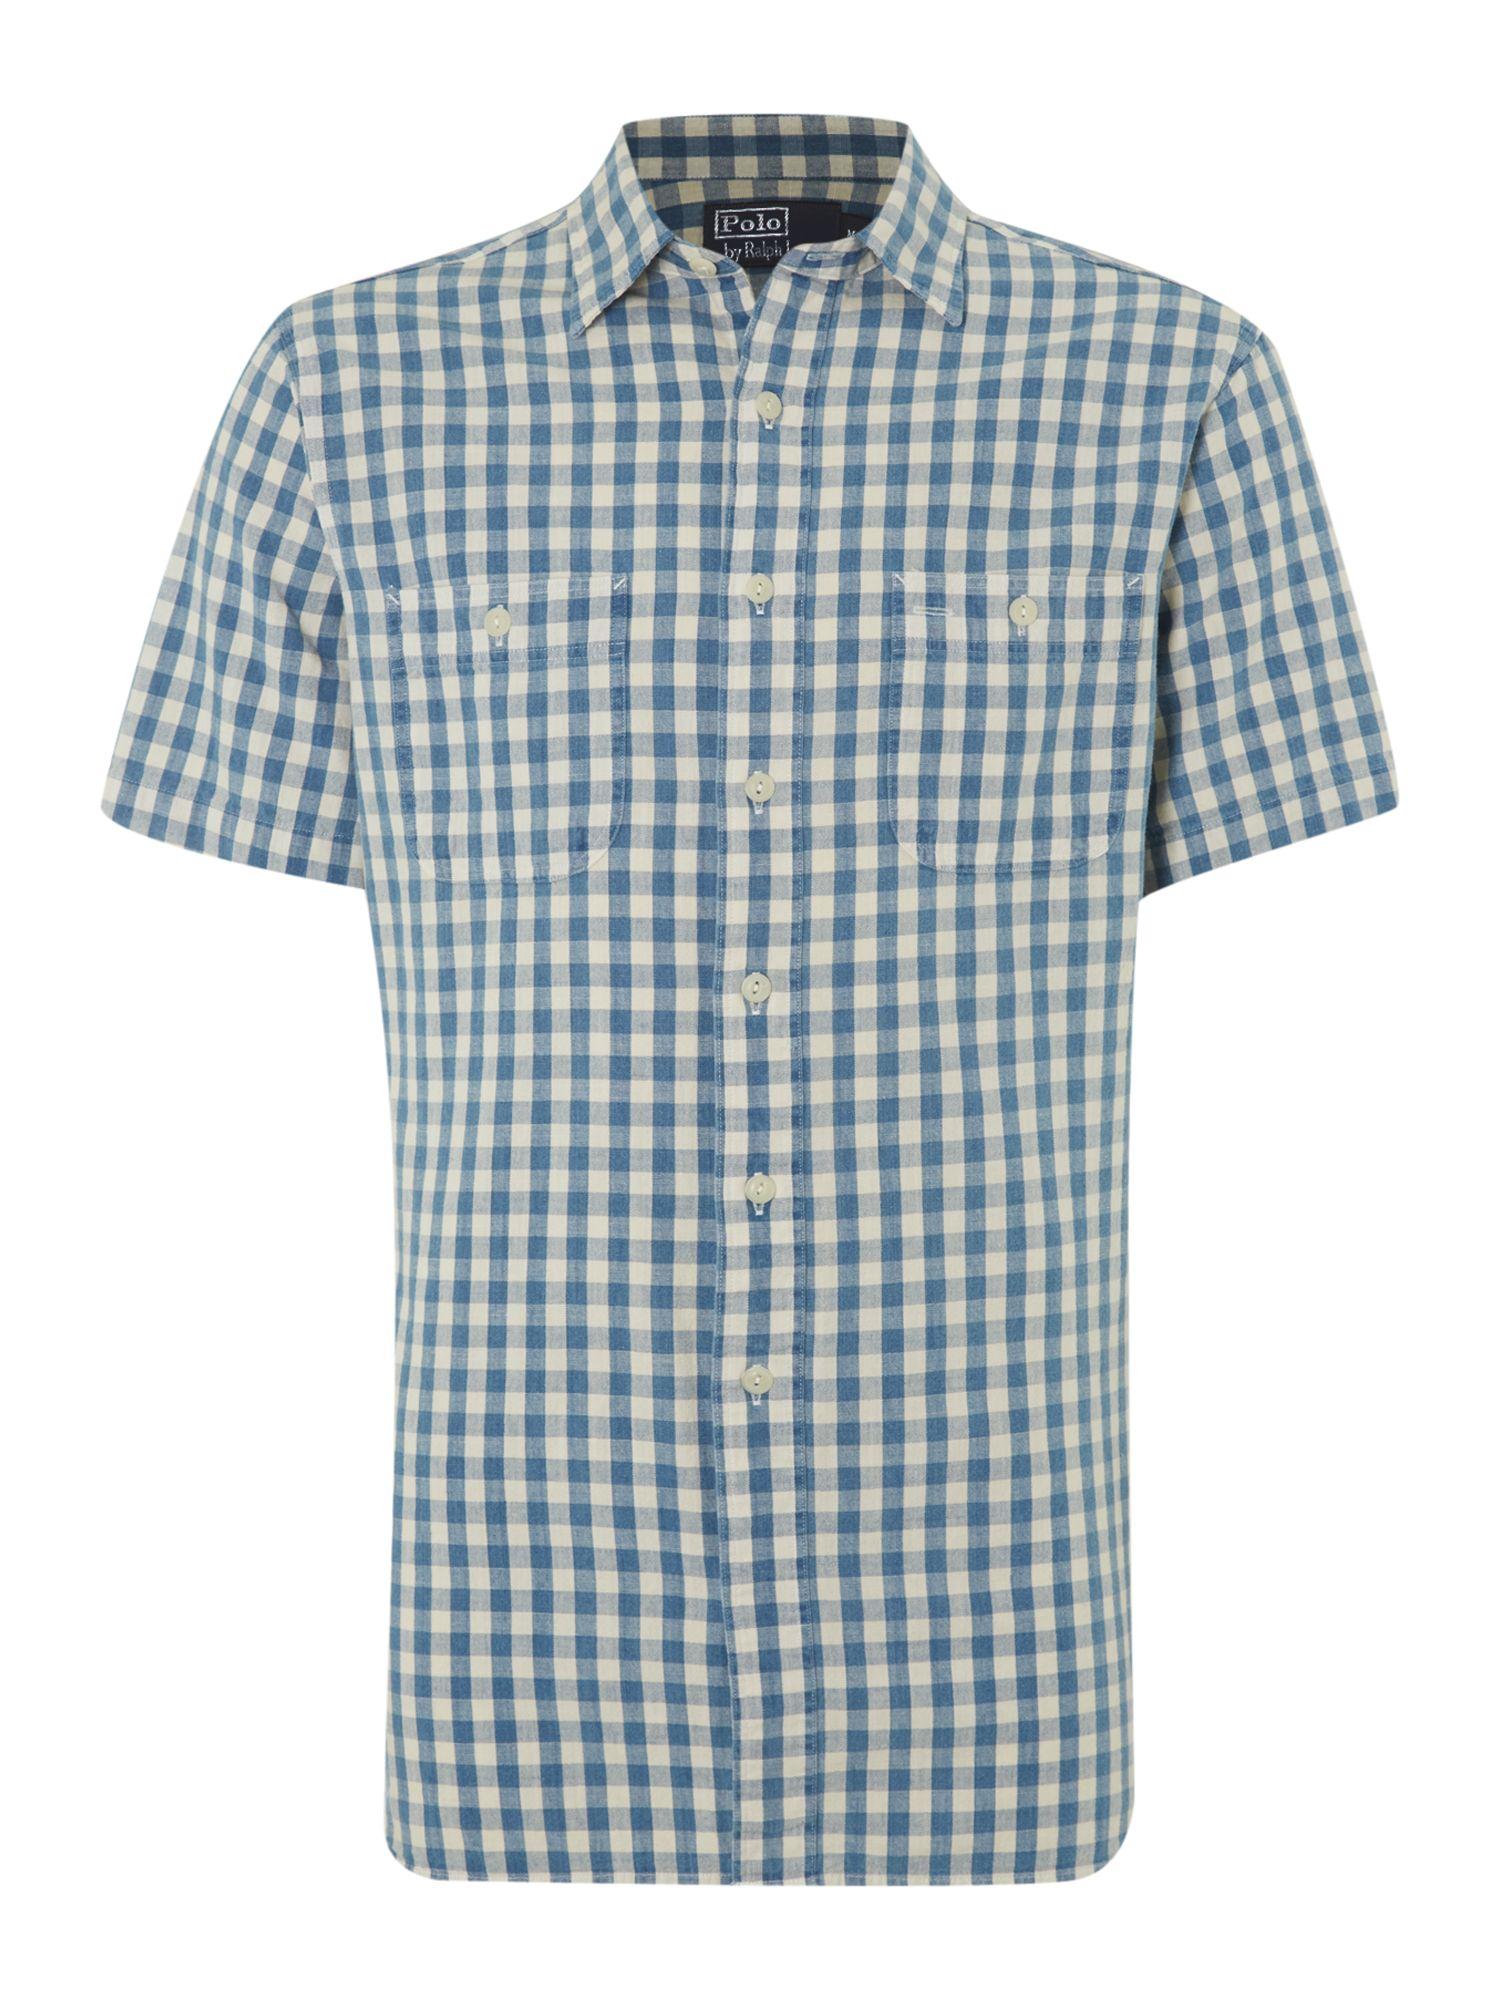 Polo Ralph Lauren Short Sleeved Check Shirt In Blue For